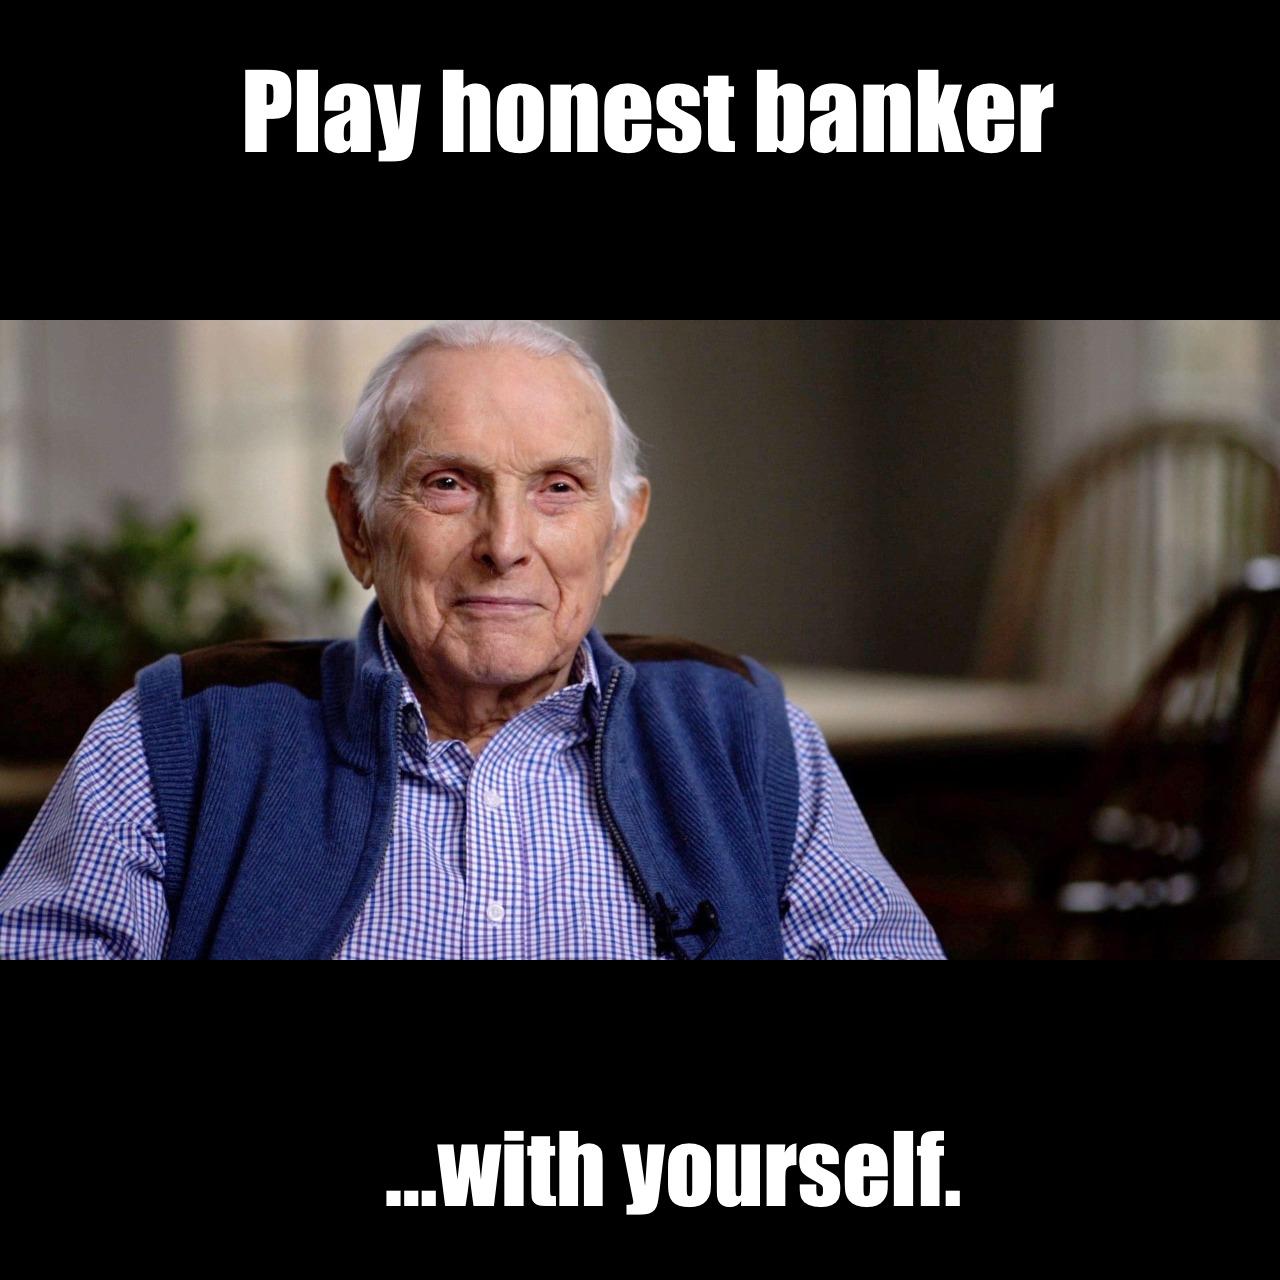 Play honest banker